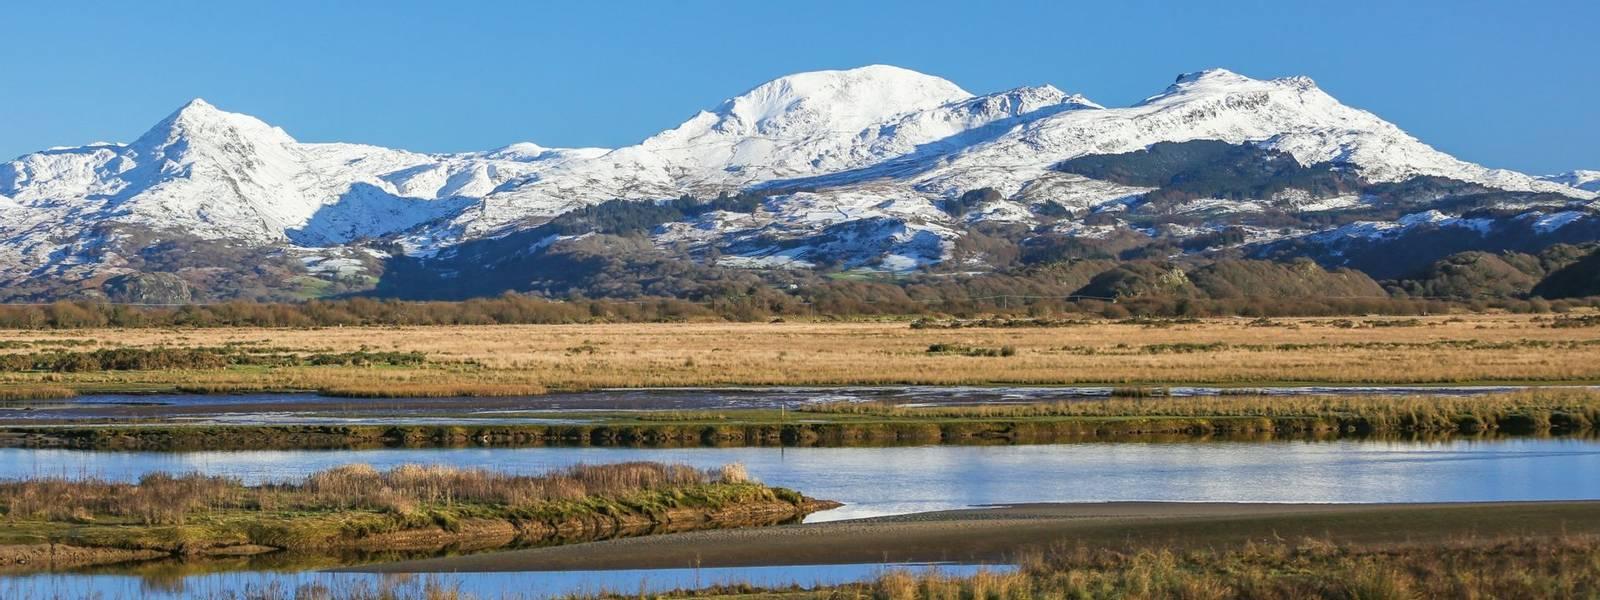 Northern Snowdonia - Walking with Sightseeing - AvdobeStock_237697411.jpeg